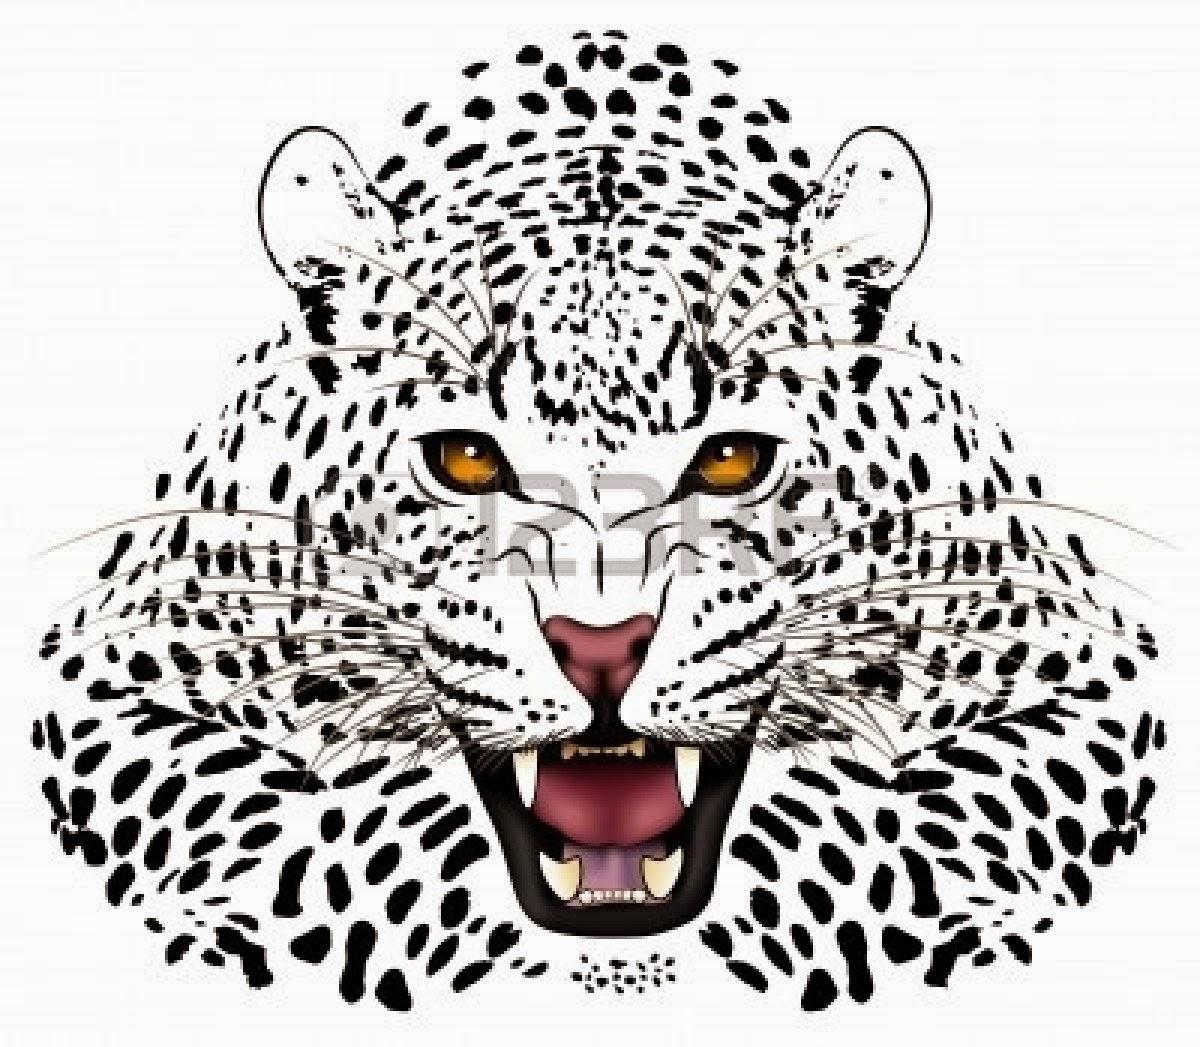 Digital Leopard wallpapers (95 Wallpapers)